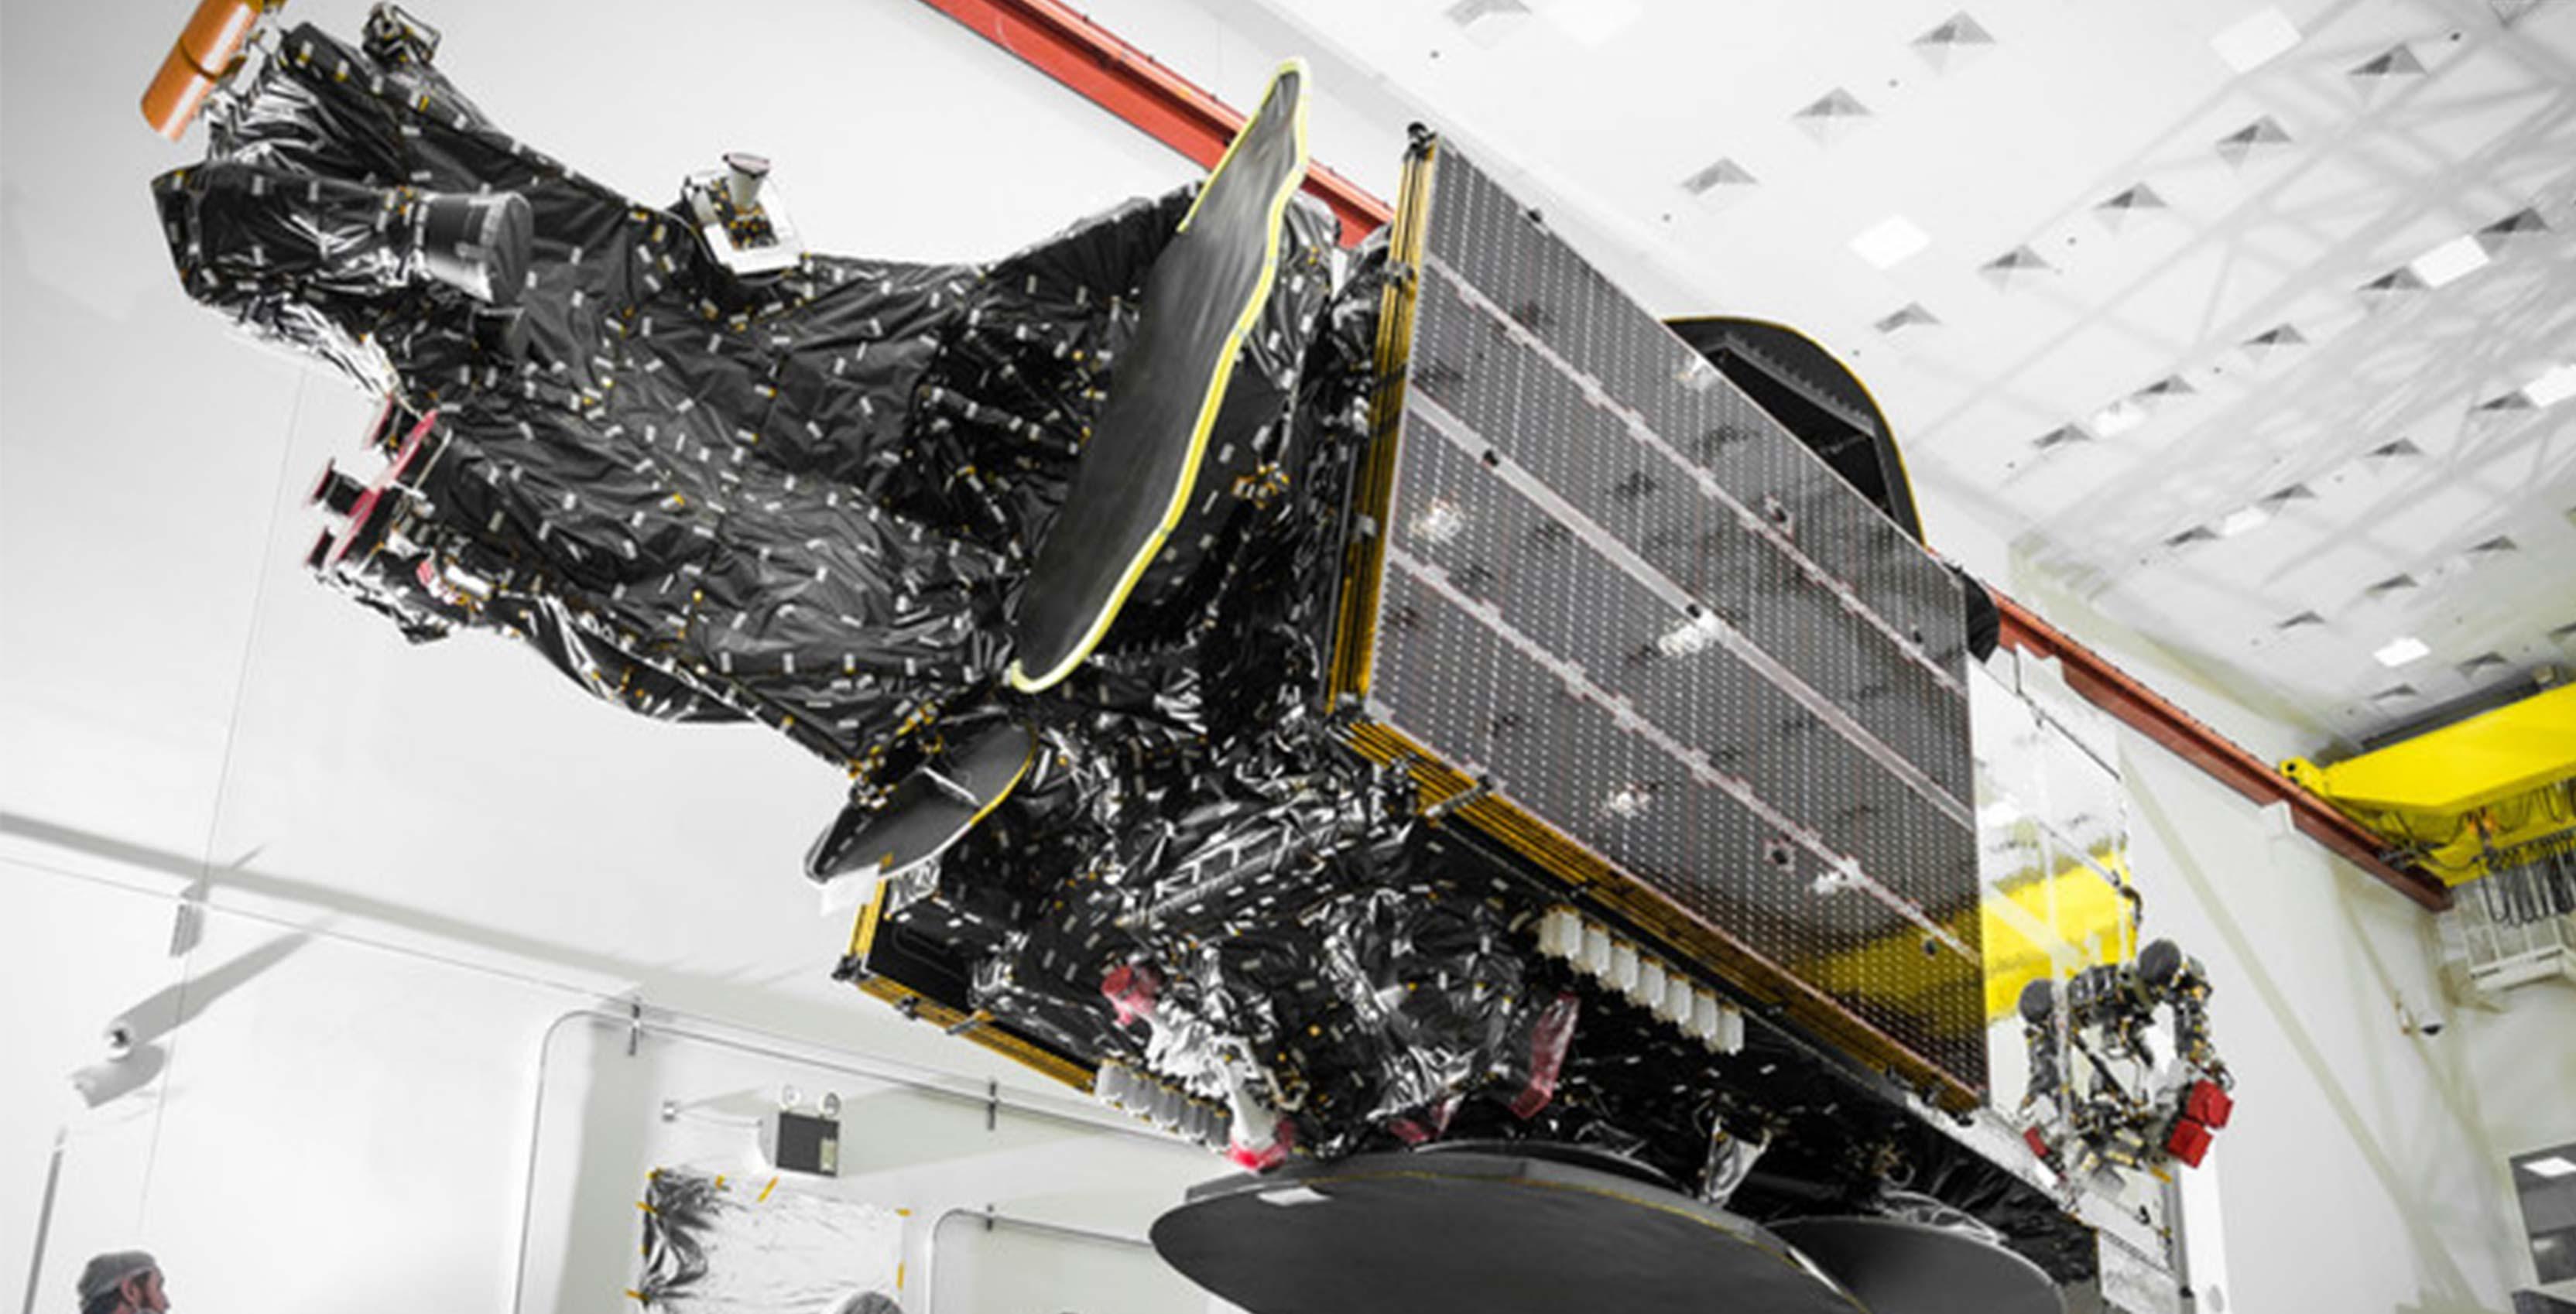 SpaceX launches Canadian Telstar 18 Vantage satellite into orbit